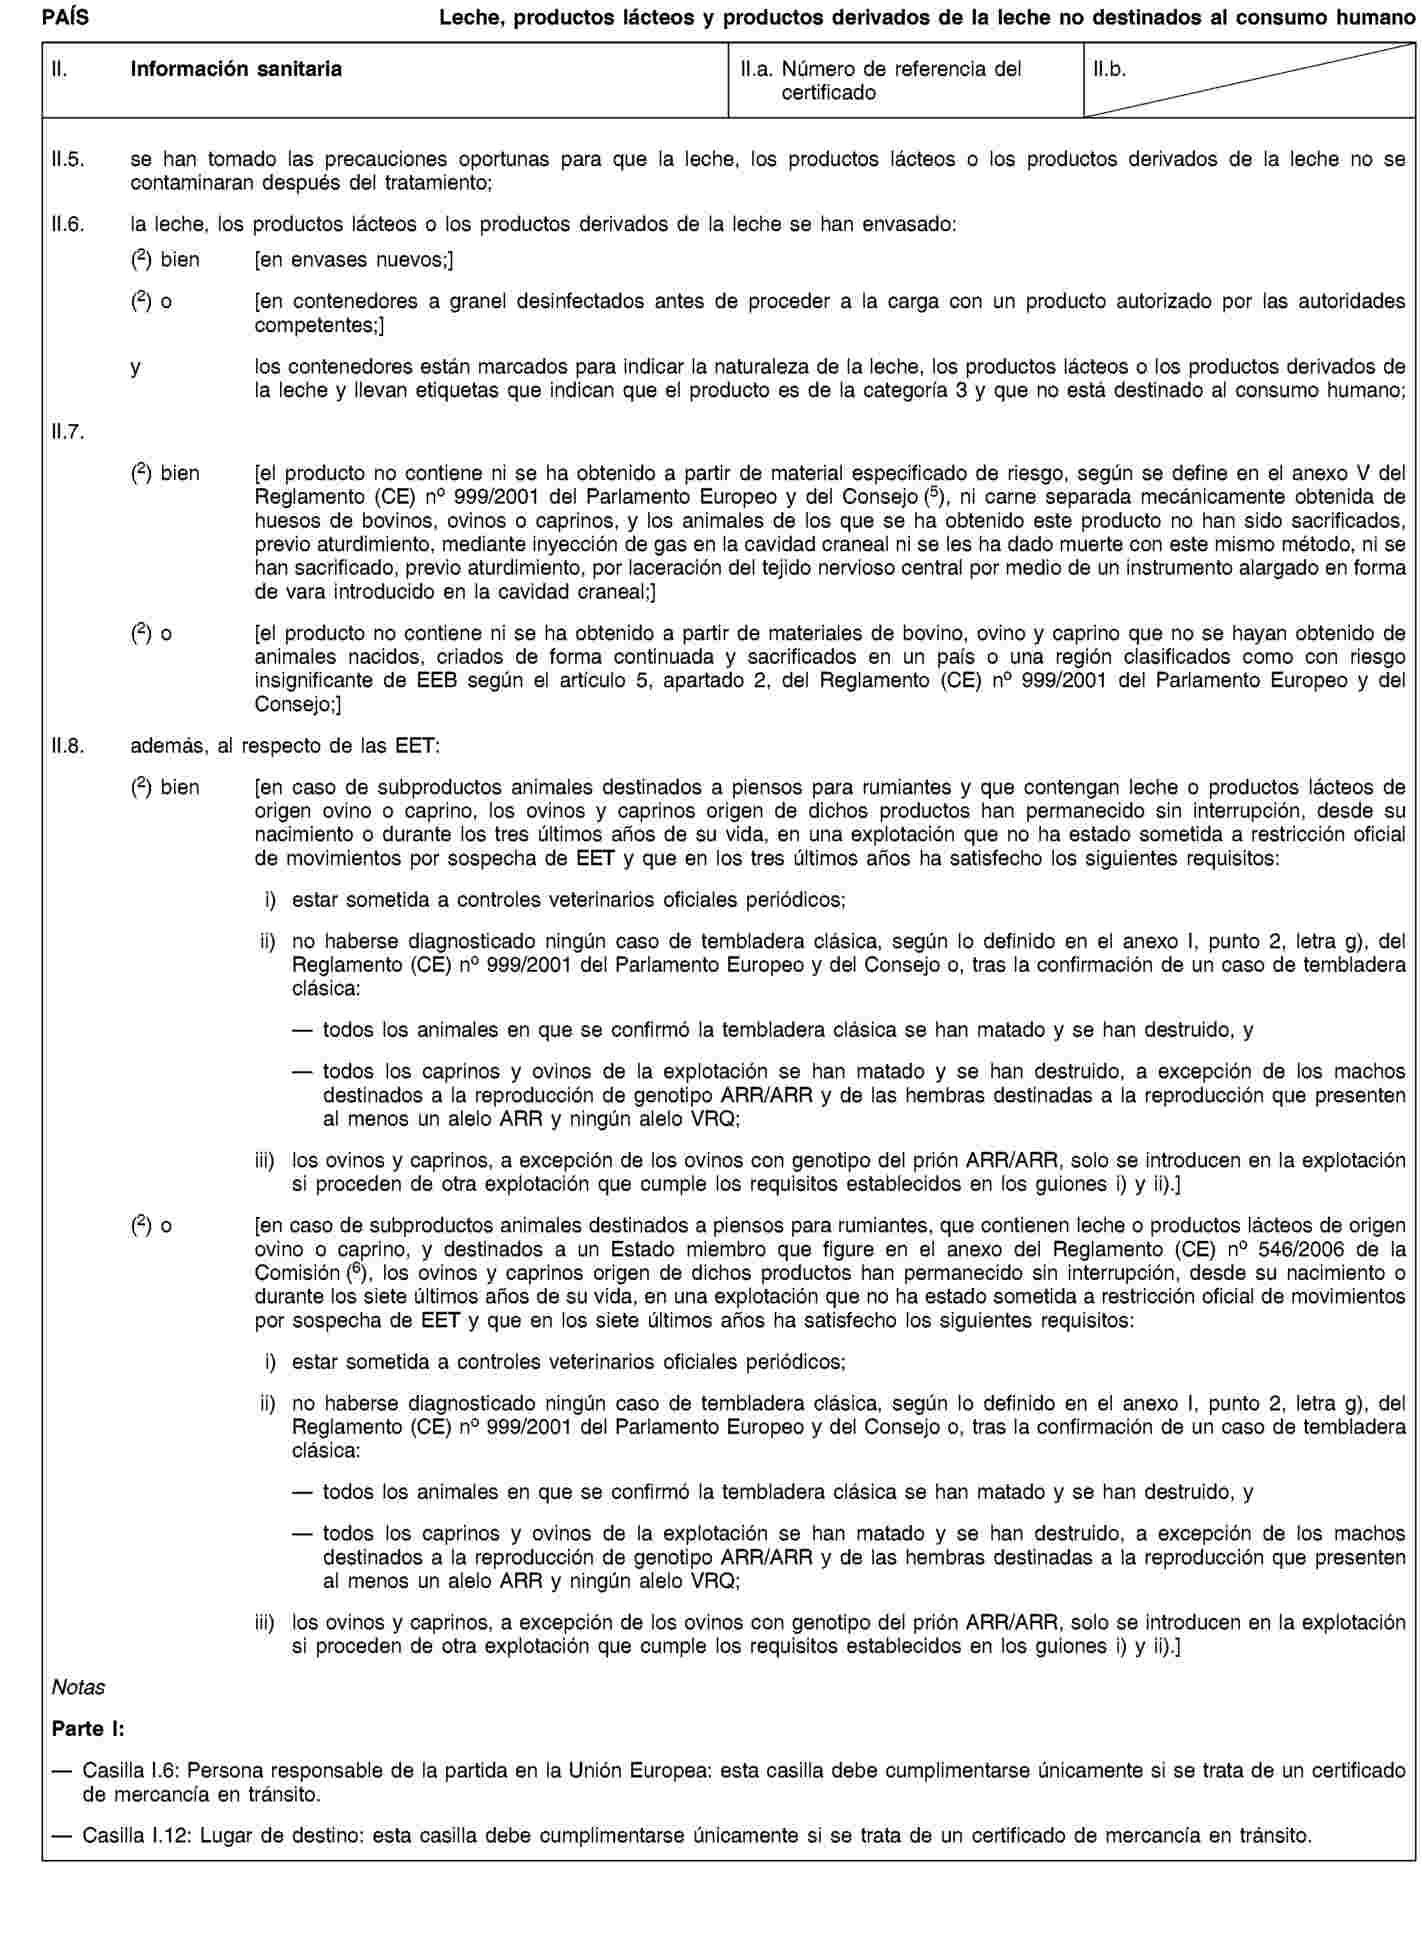 Imagen: https://eur-lex.europa.eu/resource.html?uri=uriserv:OJ.L_.2011.054.01.0001.01.SPA.xhtml.L_2011054ES.01012601.tif.jpg